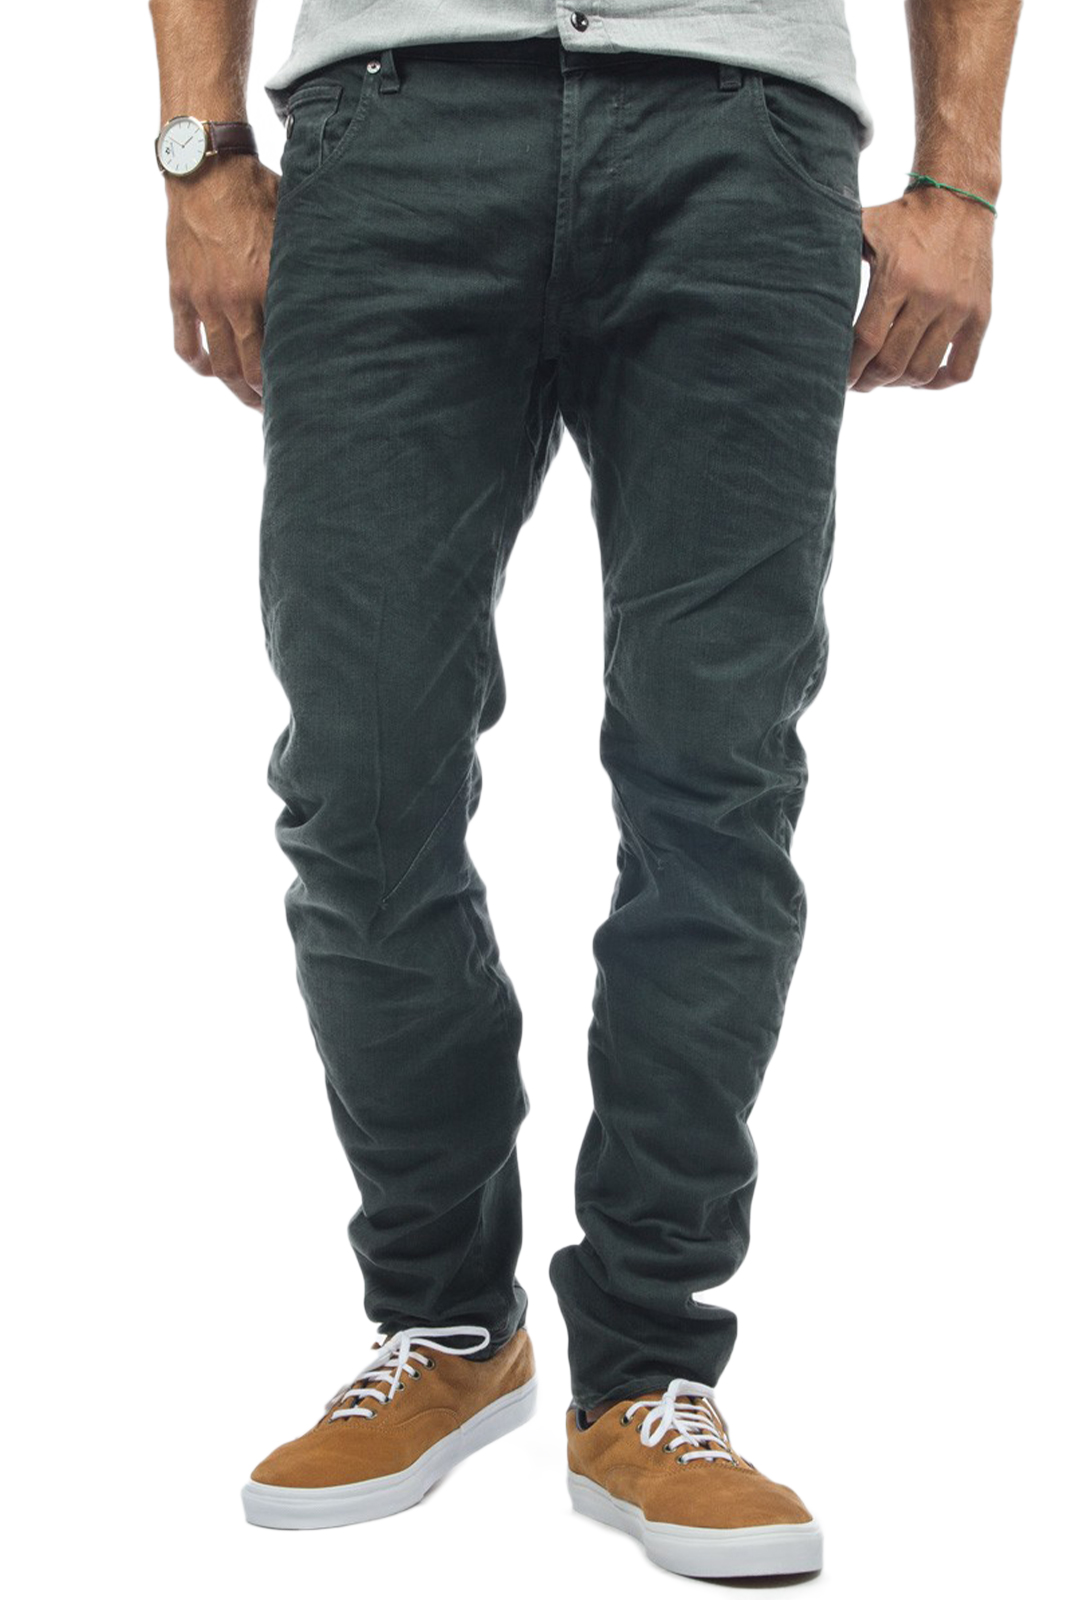 Jeans  G-star 51030F-5633-4504 arc vert